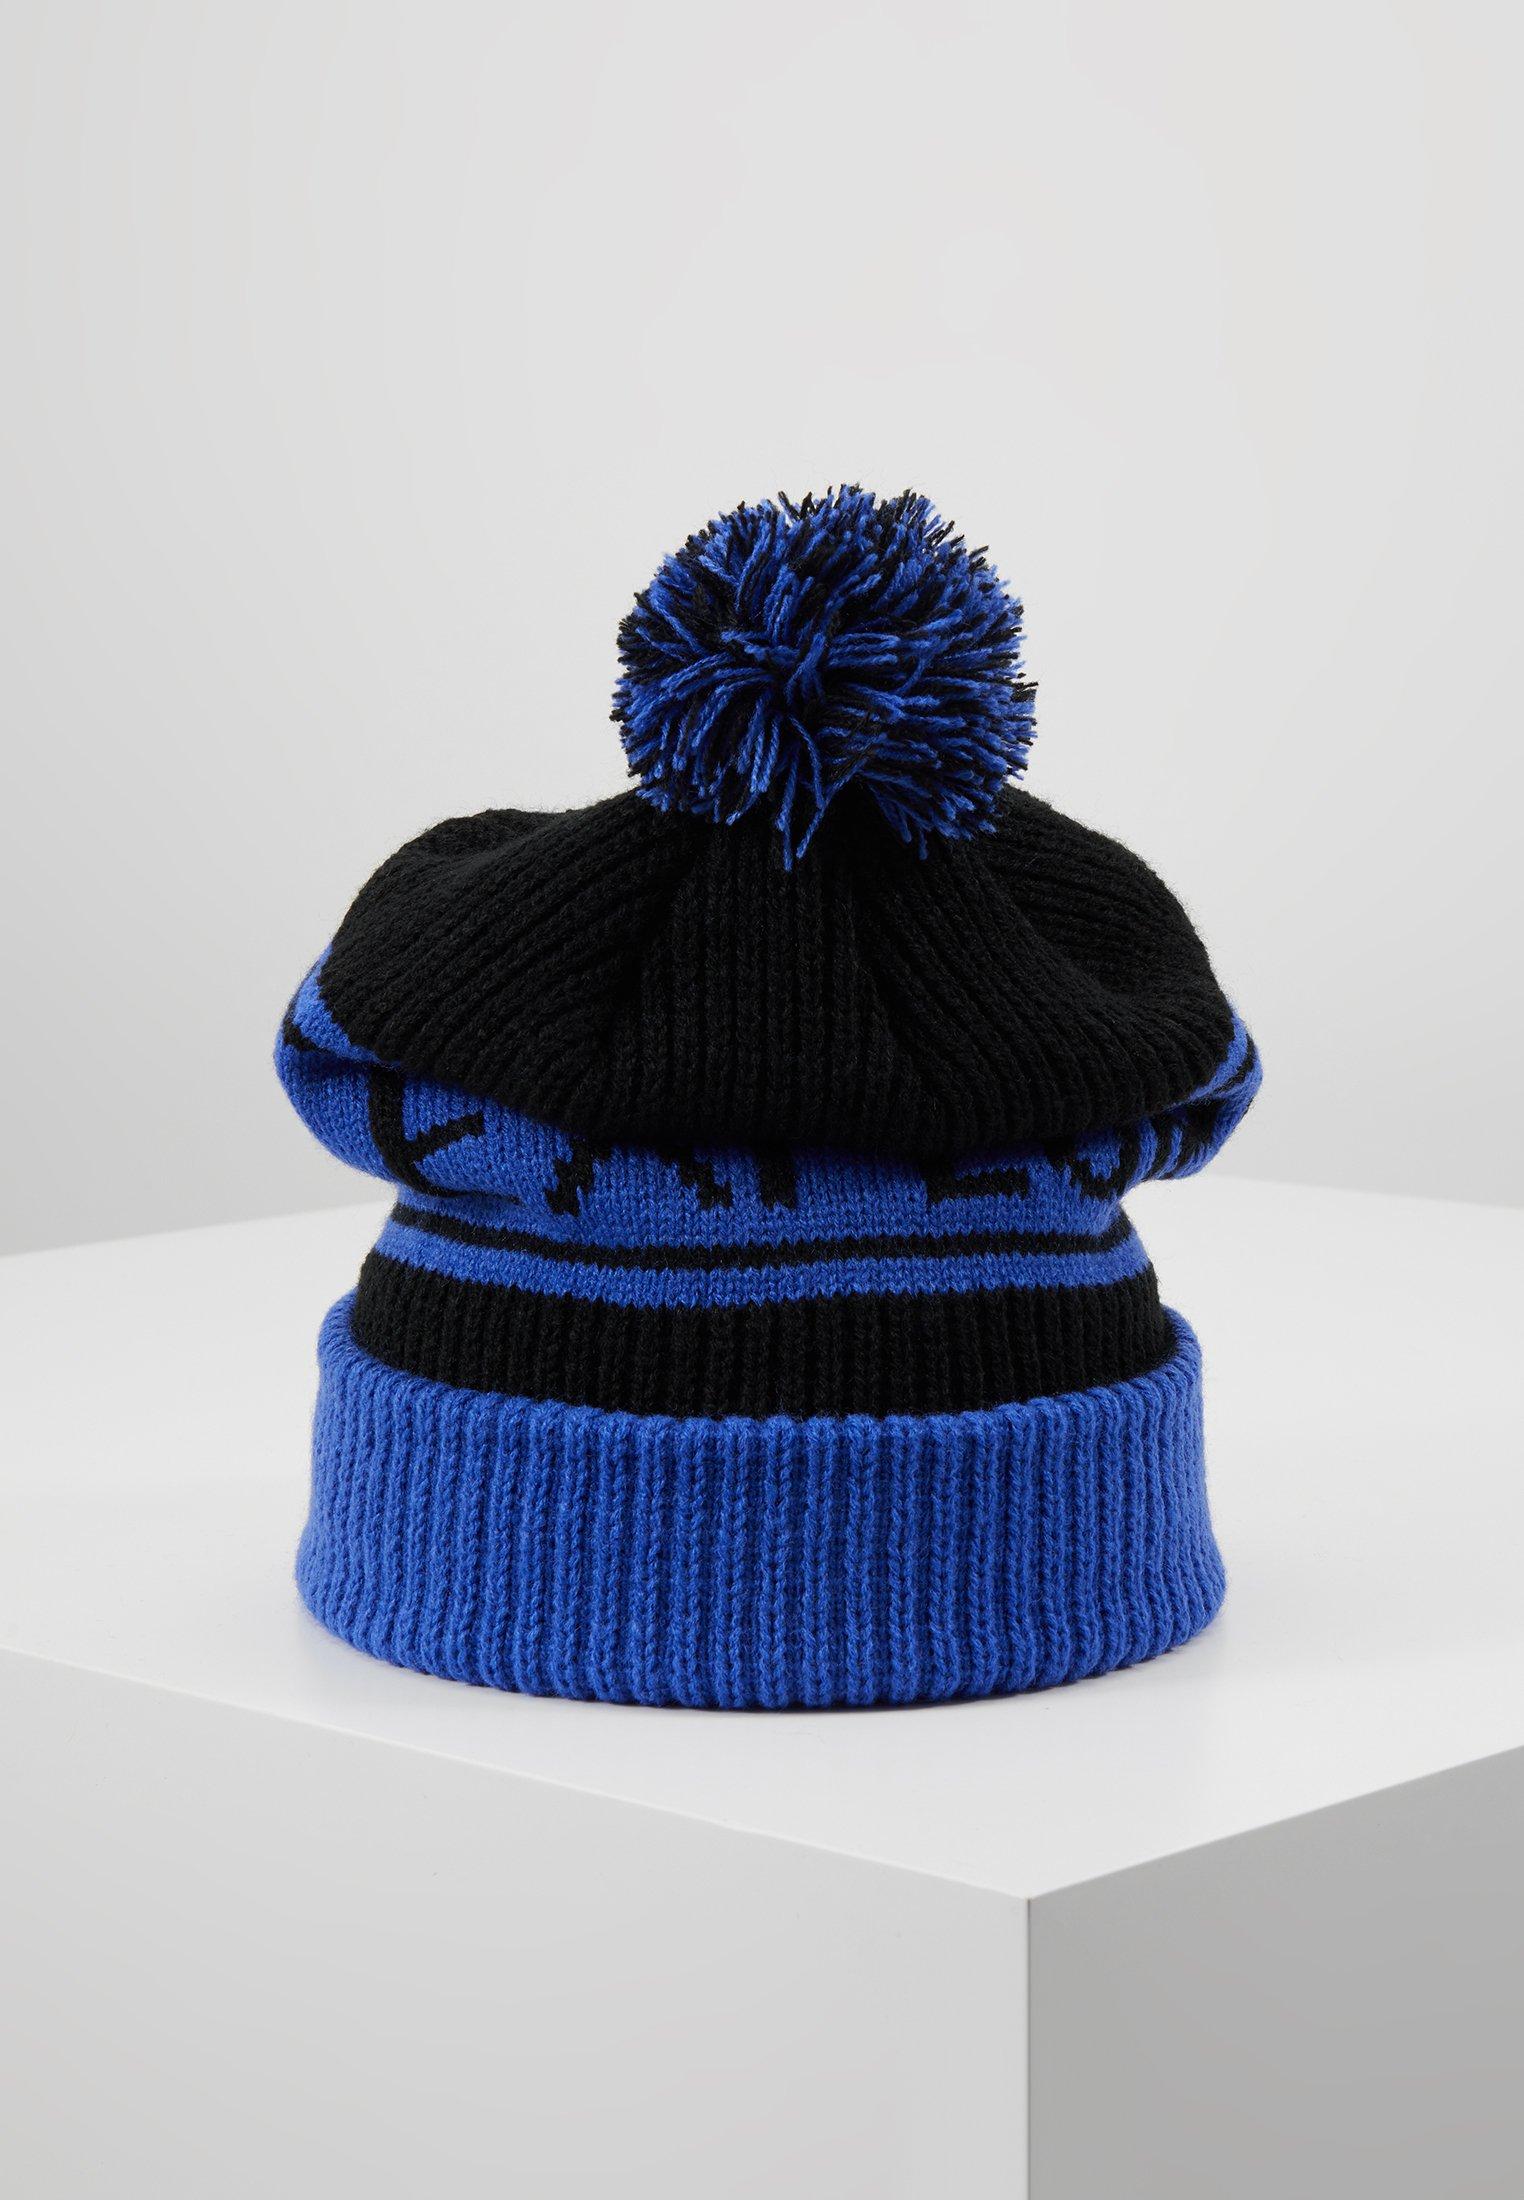 The North Face Retro Pom - Mütze Blue/black/blau